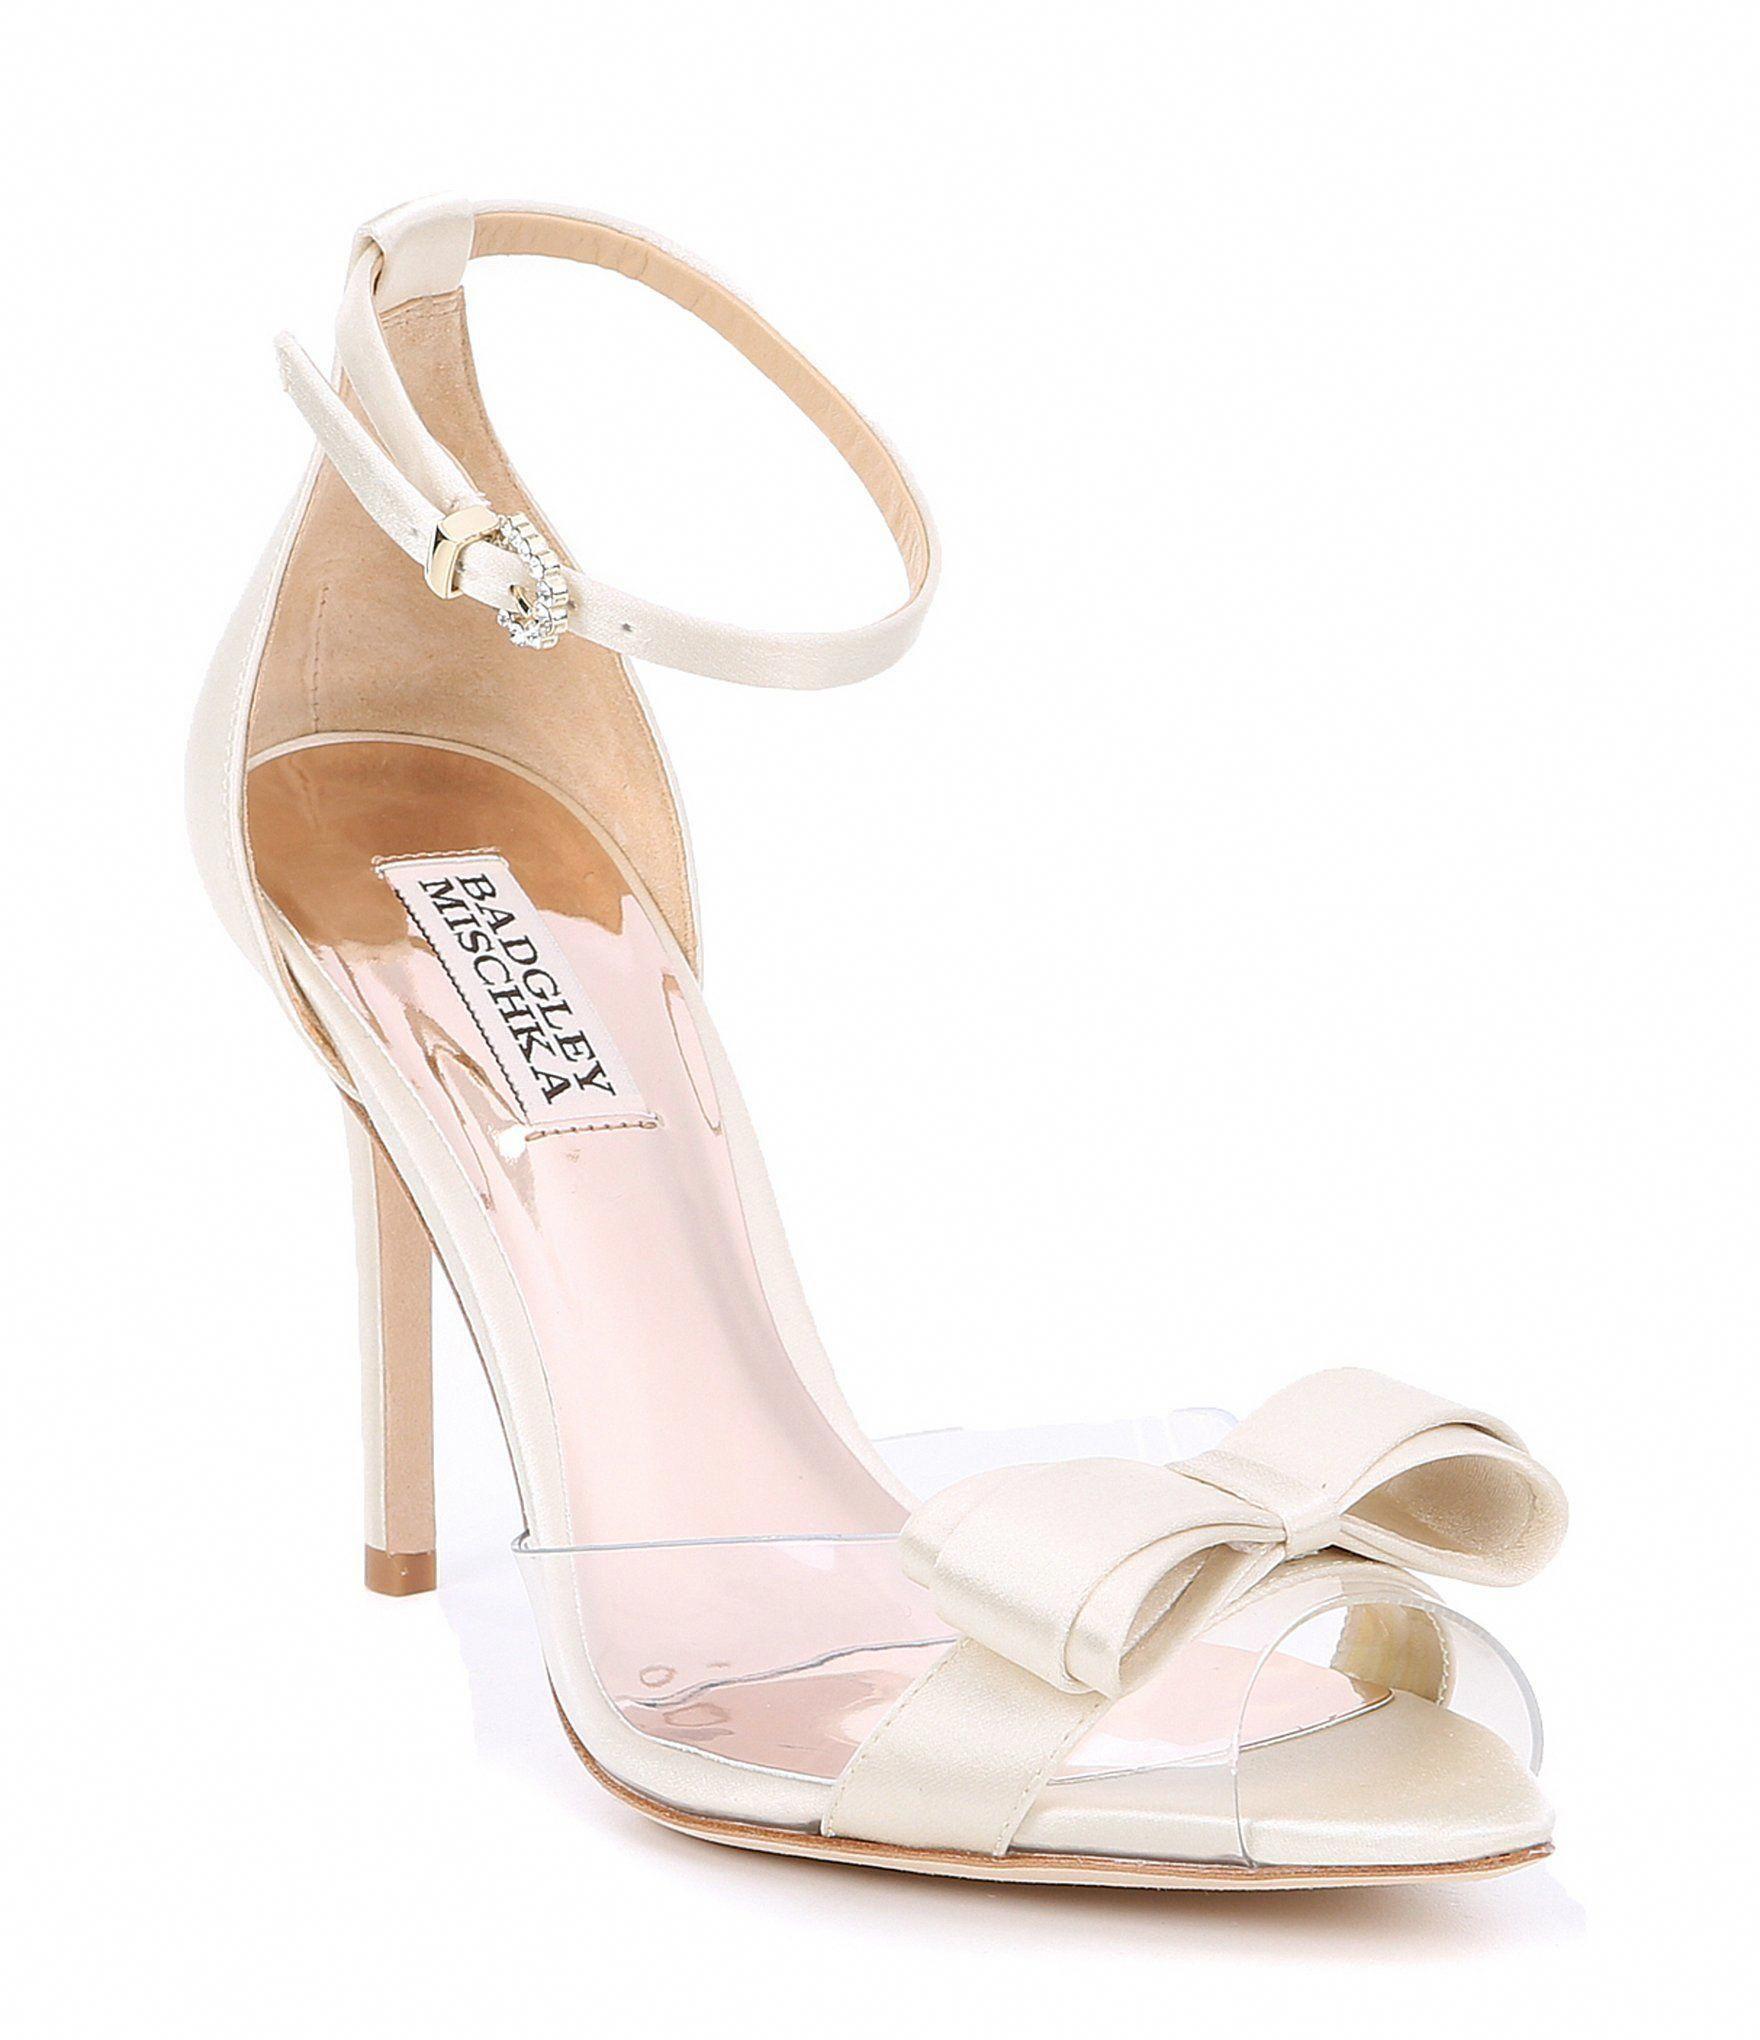 Shop For Badgley Mischka Lindsay Fabric Clear Dress Sandals At Dillards Com Visit Dillards Com To Find Clothin Wedding Shoes Heels Bride Shoes Wedding Boots